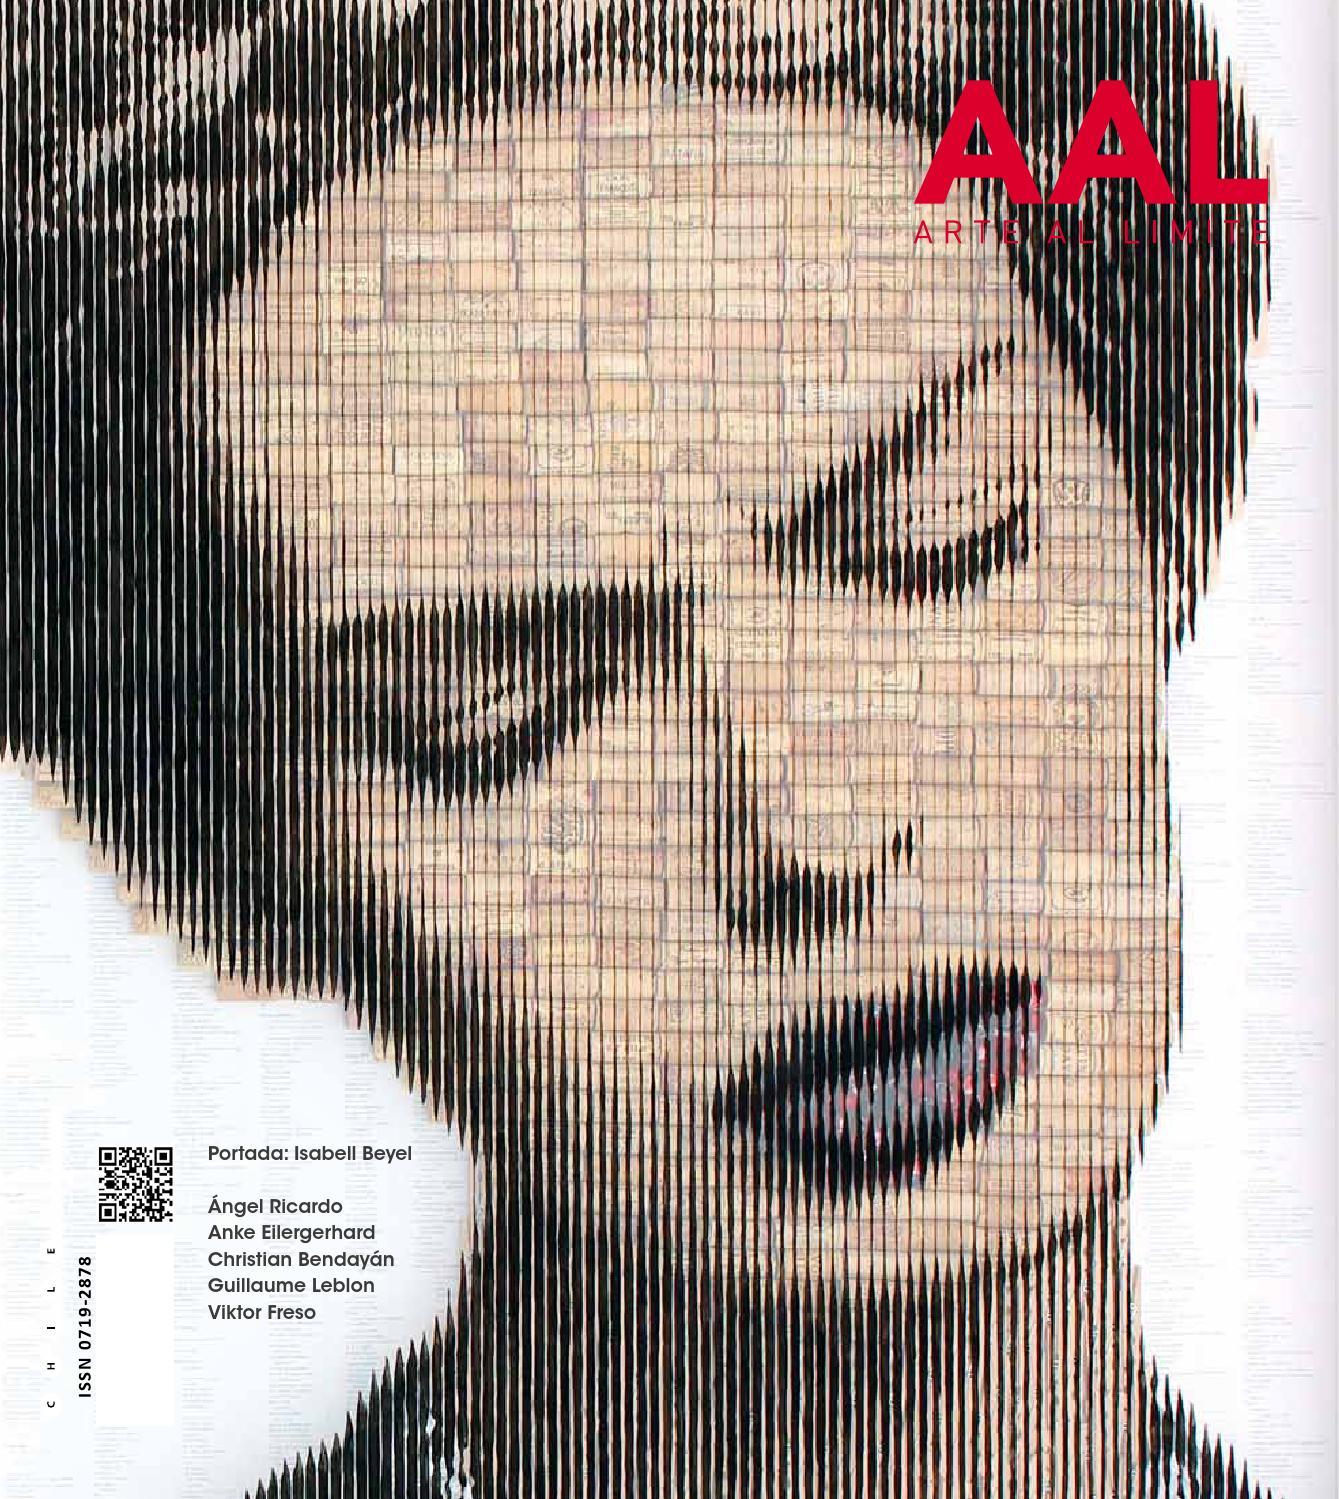 Revista noviembre - diciembre Ed 75 by Arte al Límite - issuu 129c4e7c964